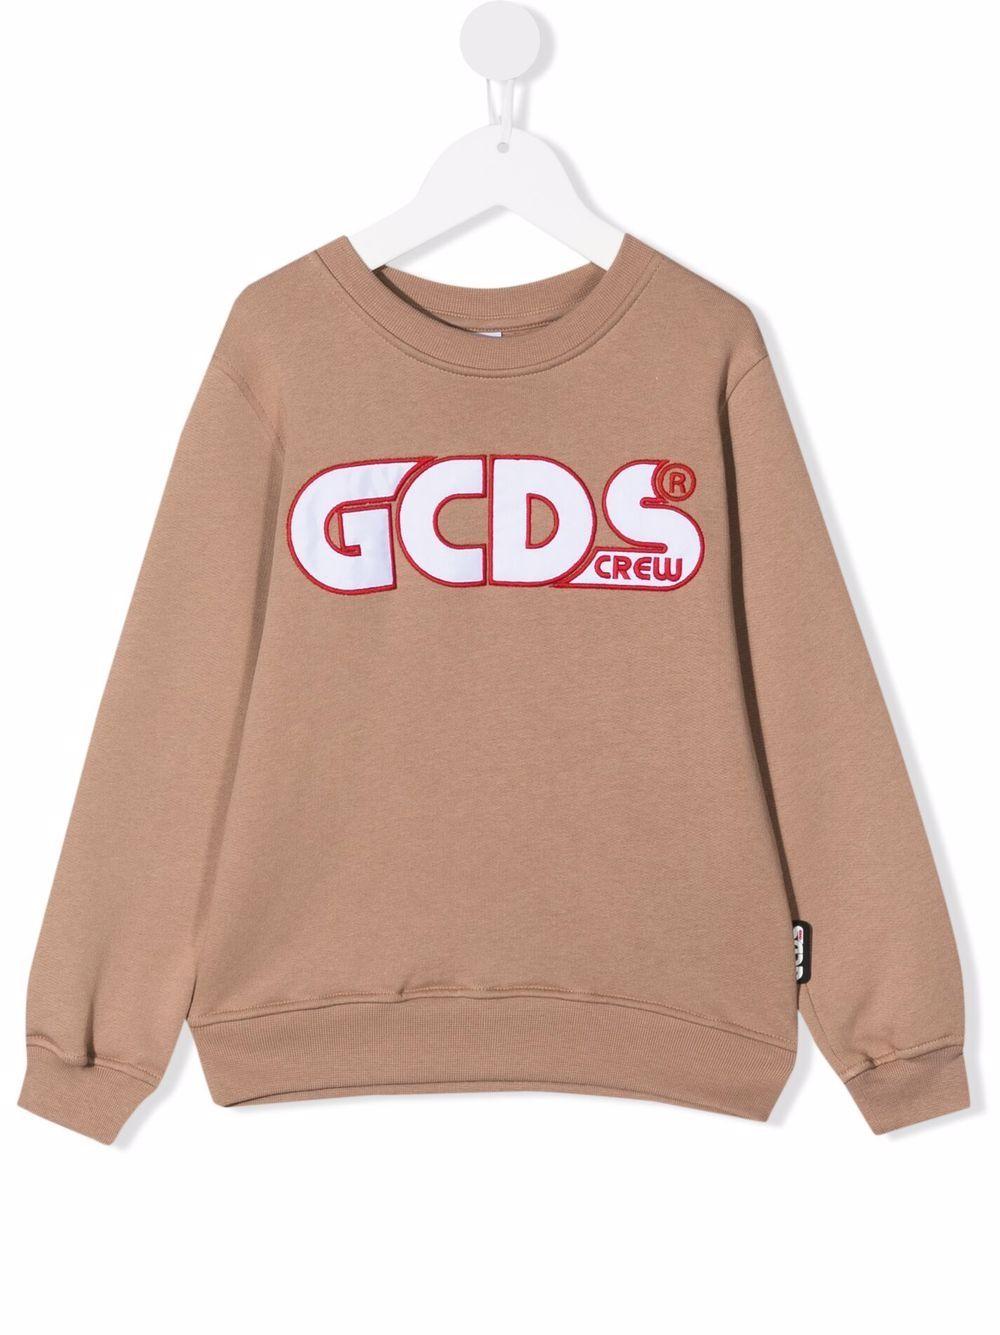 FELPA CREW GCDS KIDS | Felpa | 028489094#